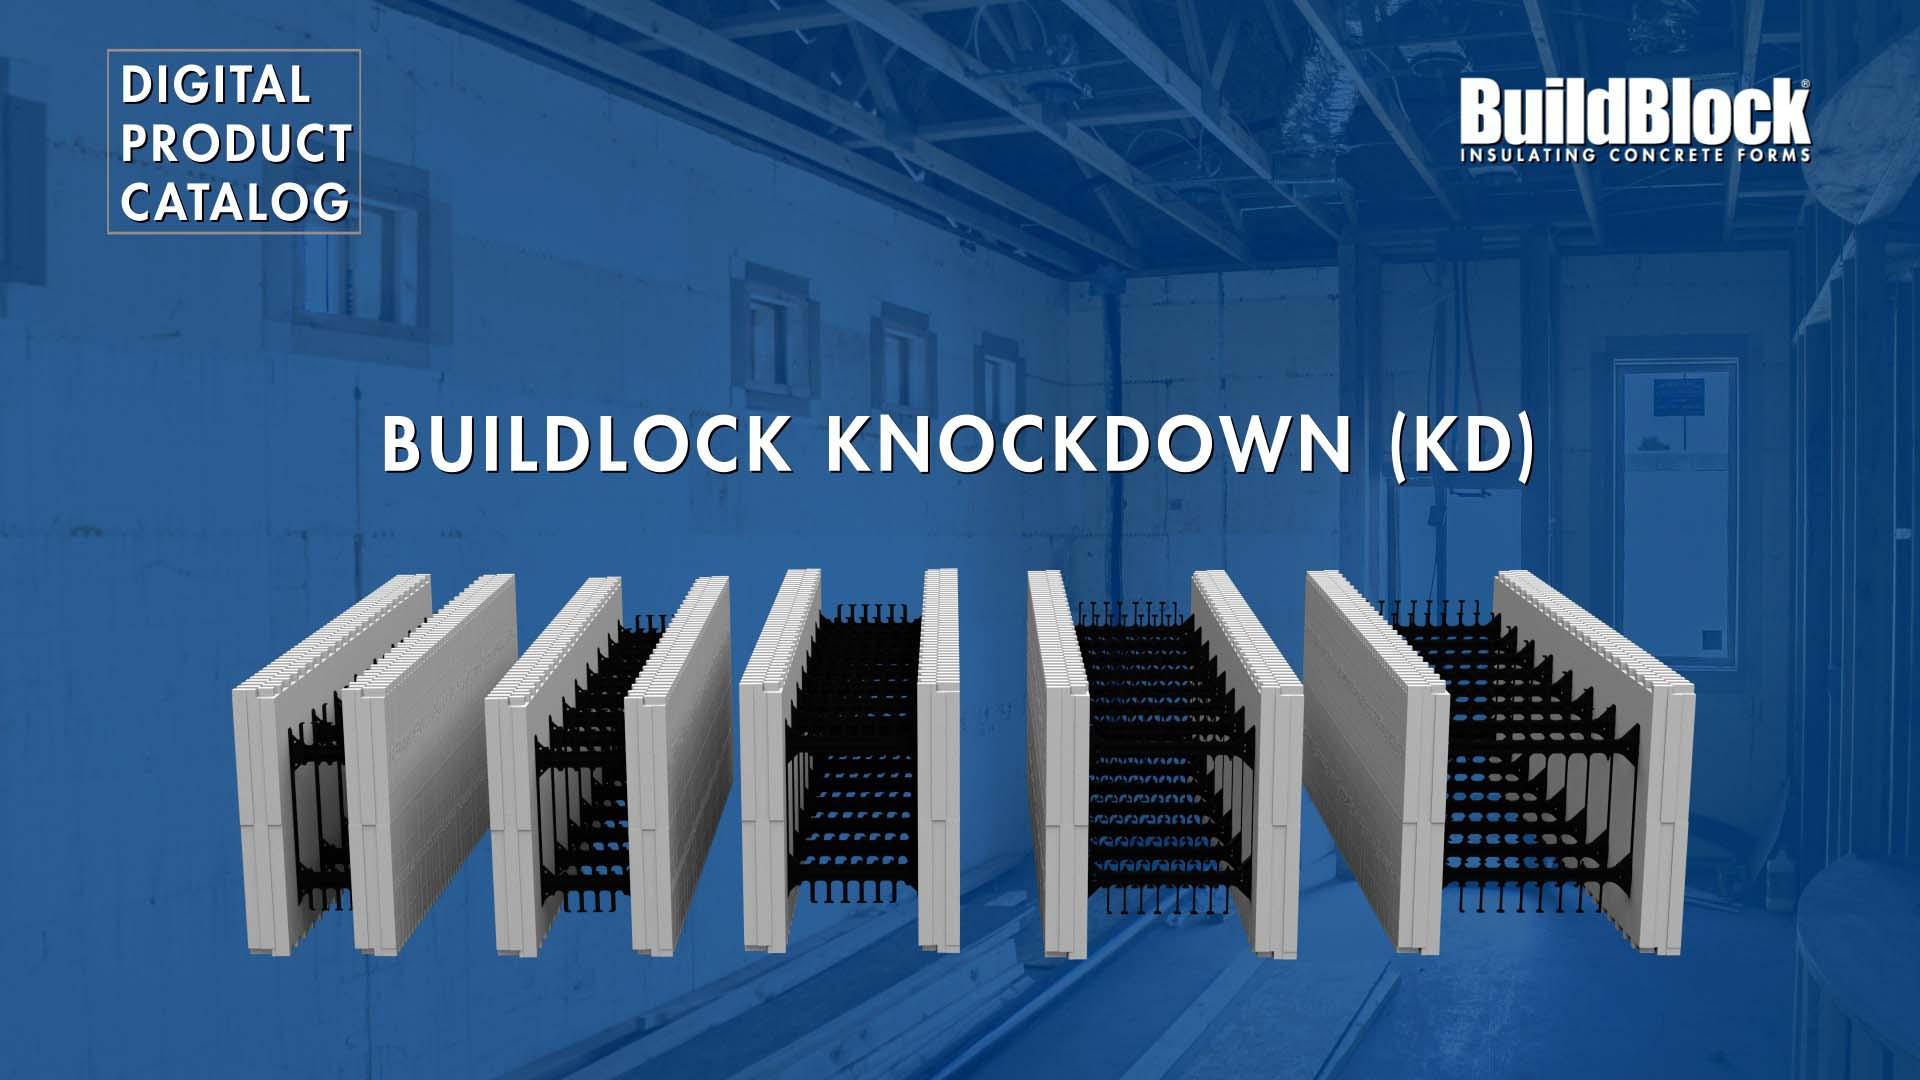 Video: Digital Product Catalog: BuildLock KnockDown (KD)